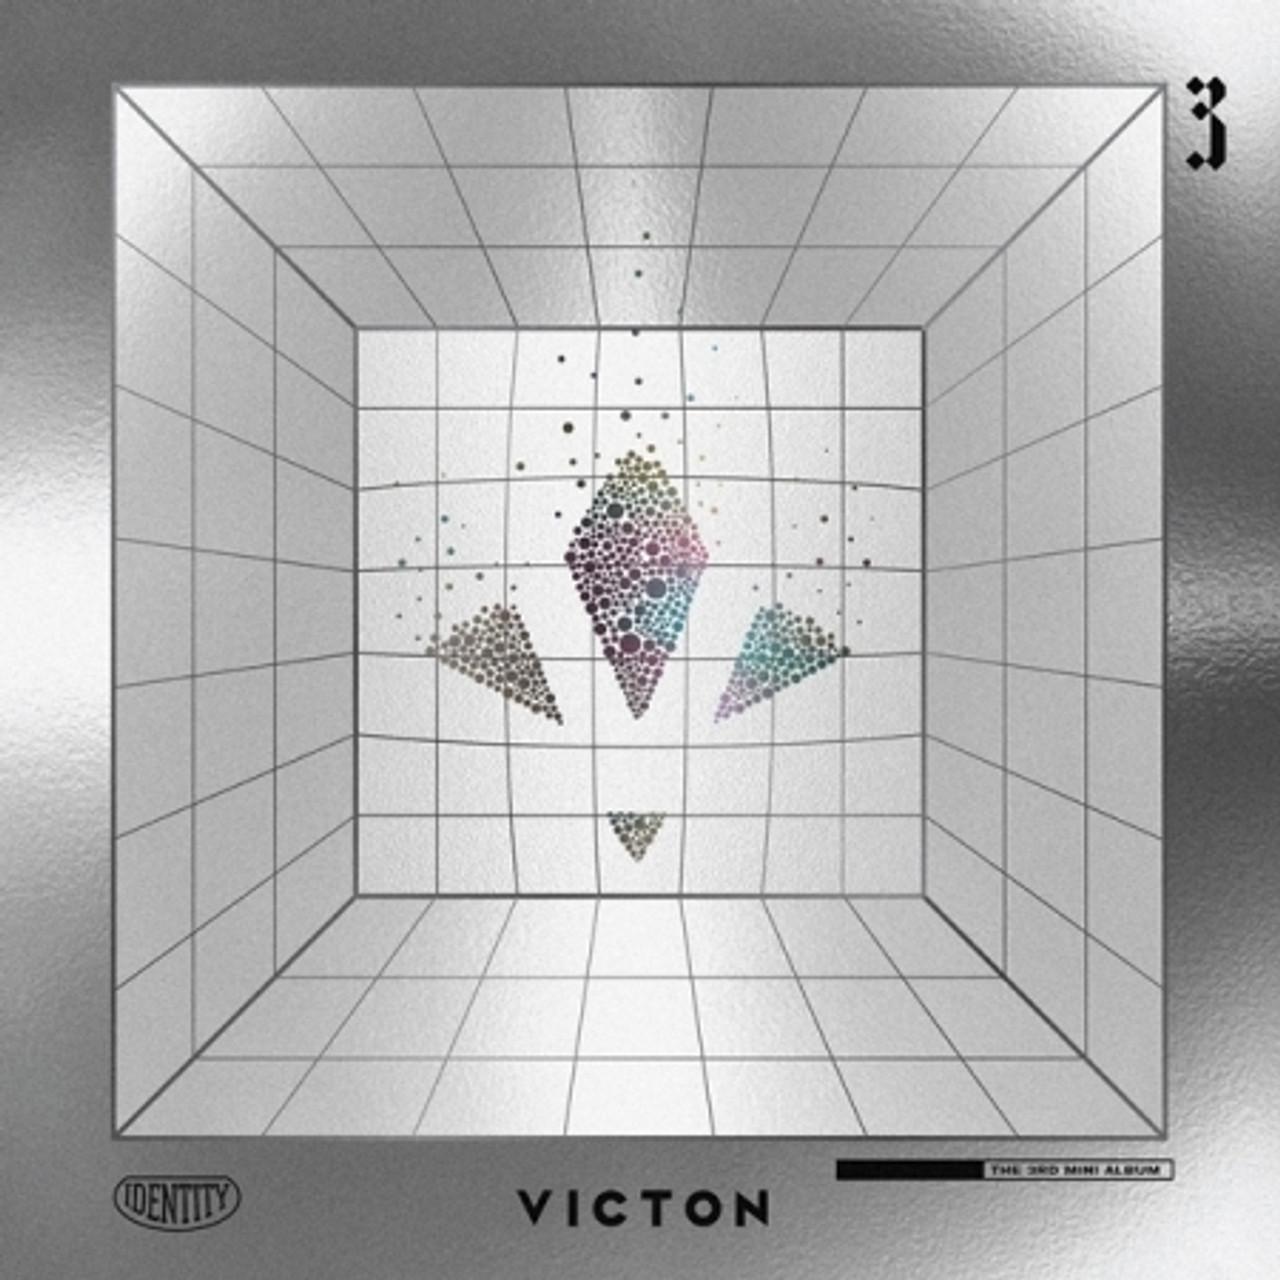 VICTON - 3rd Mini / IDENTITY